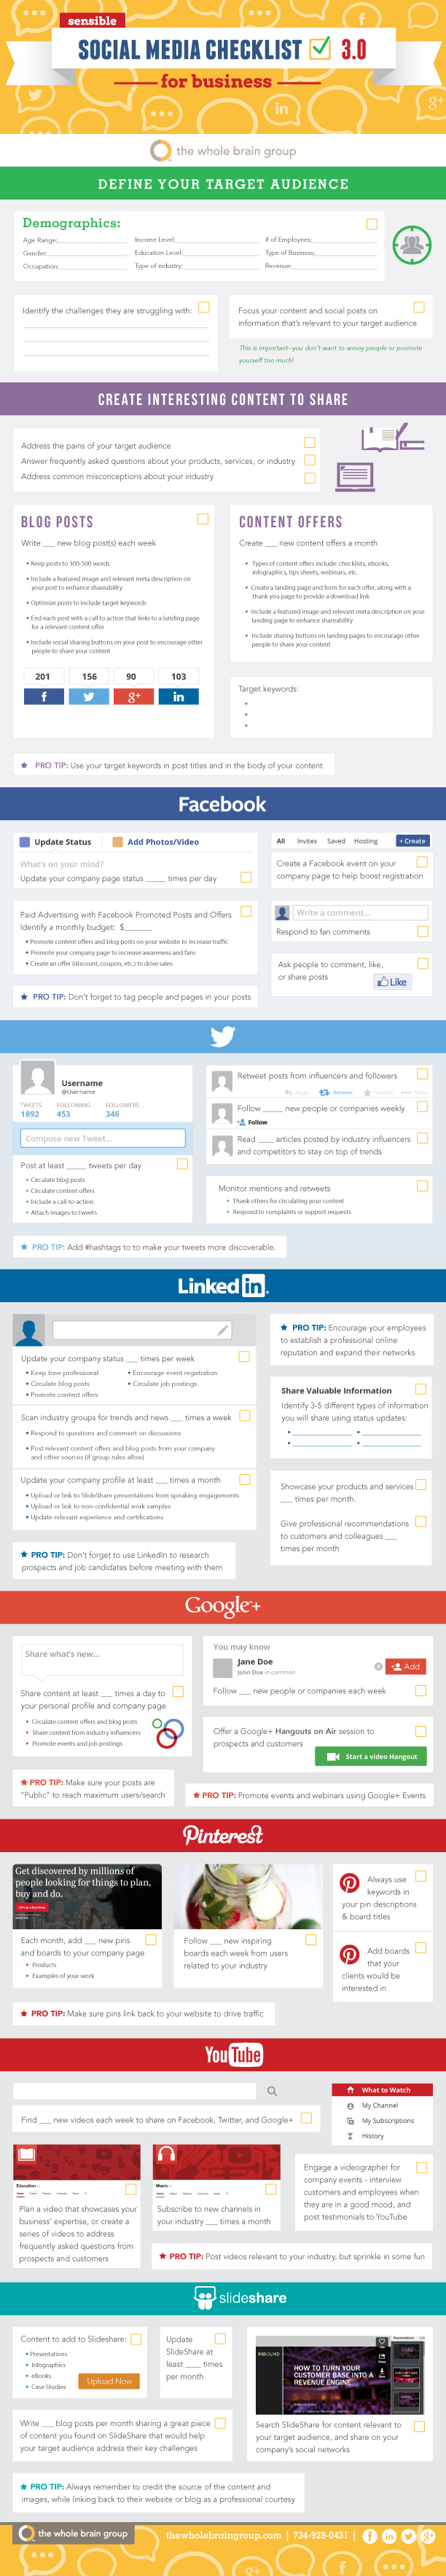 Social Media checklist (versión 3)